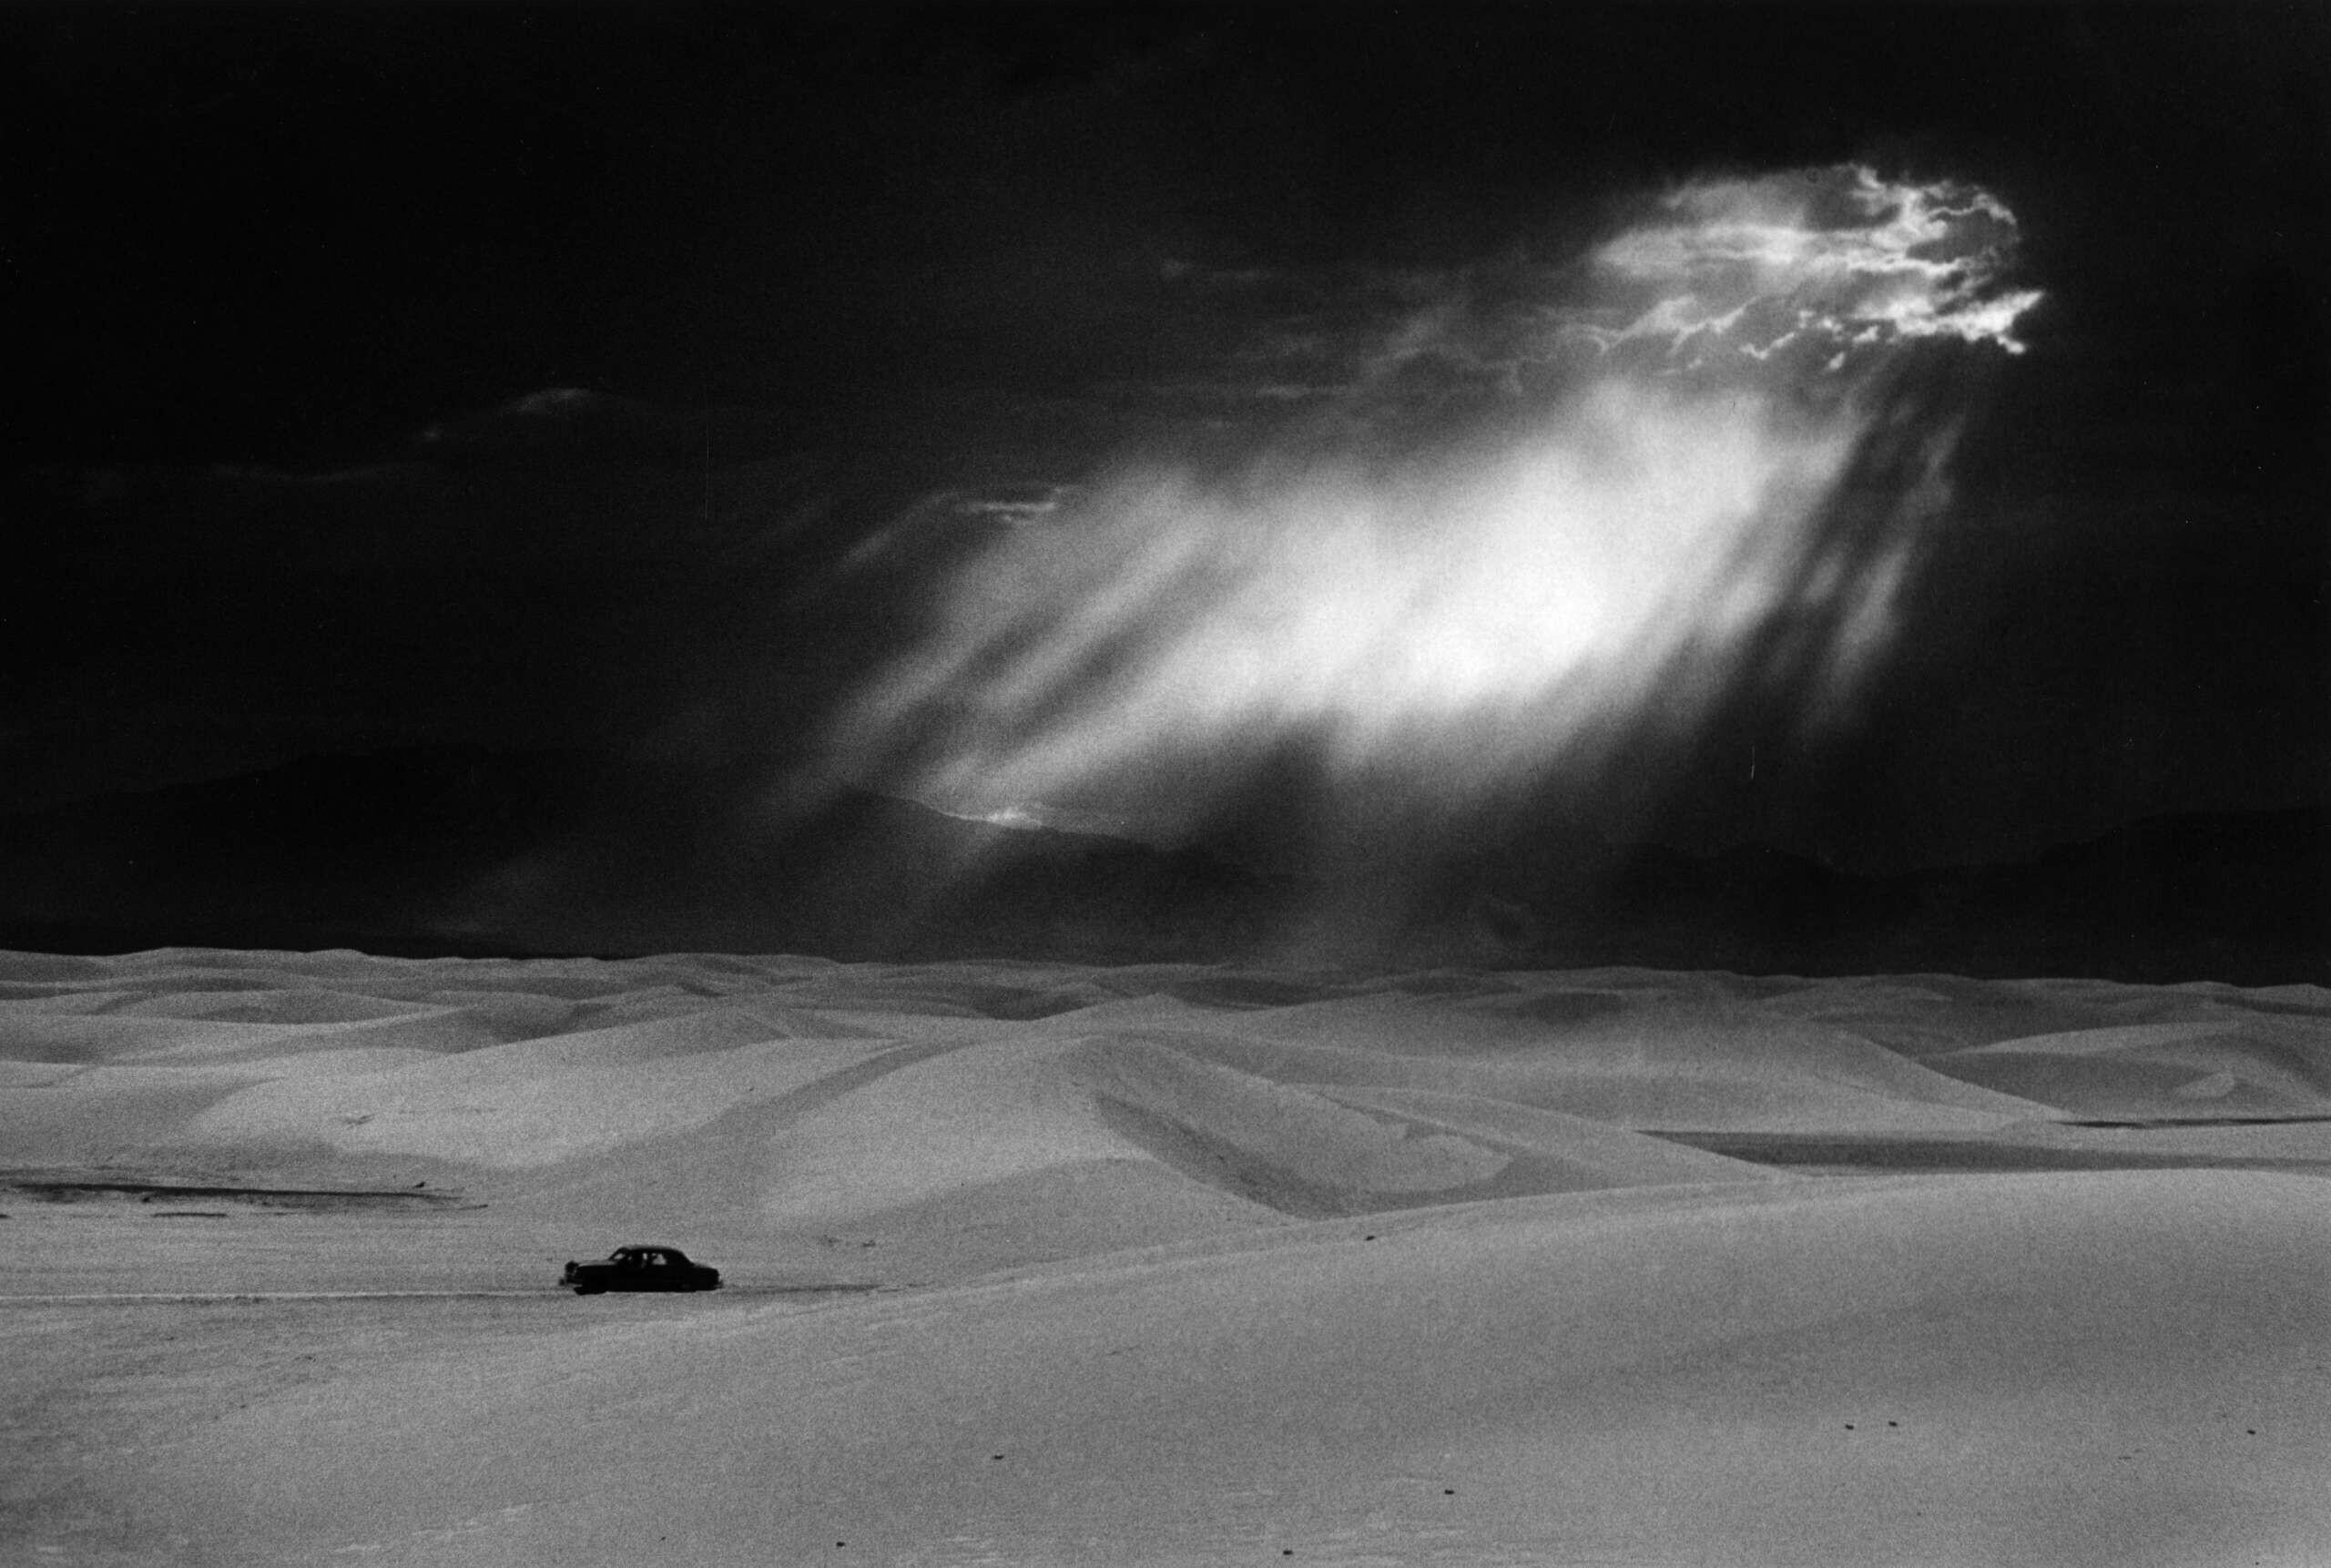 Уайт-Сандс, Нью-Мексико, 1952. Фотограф Эрнст Хаас